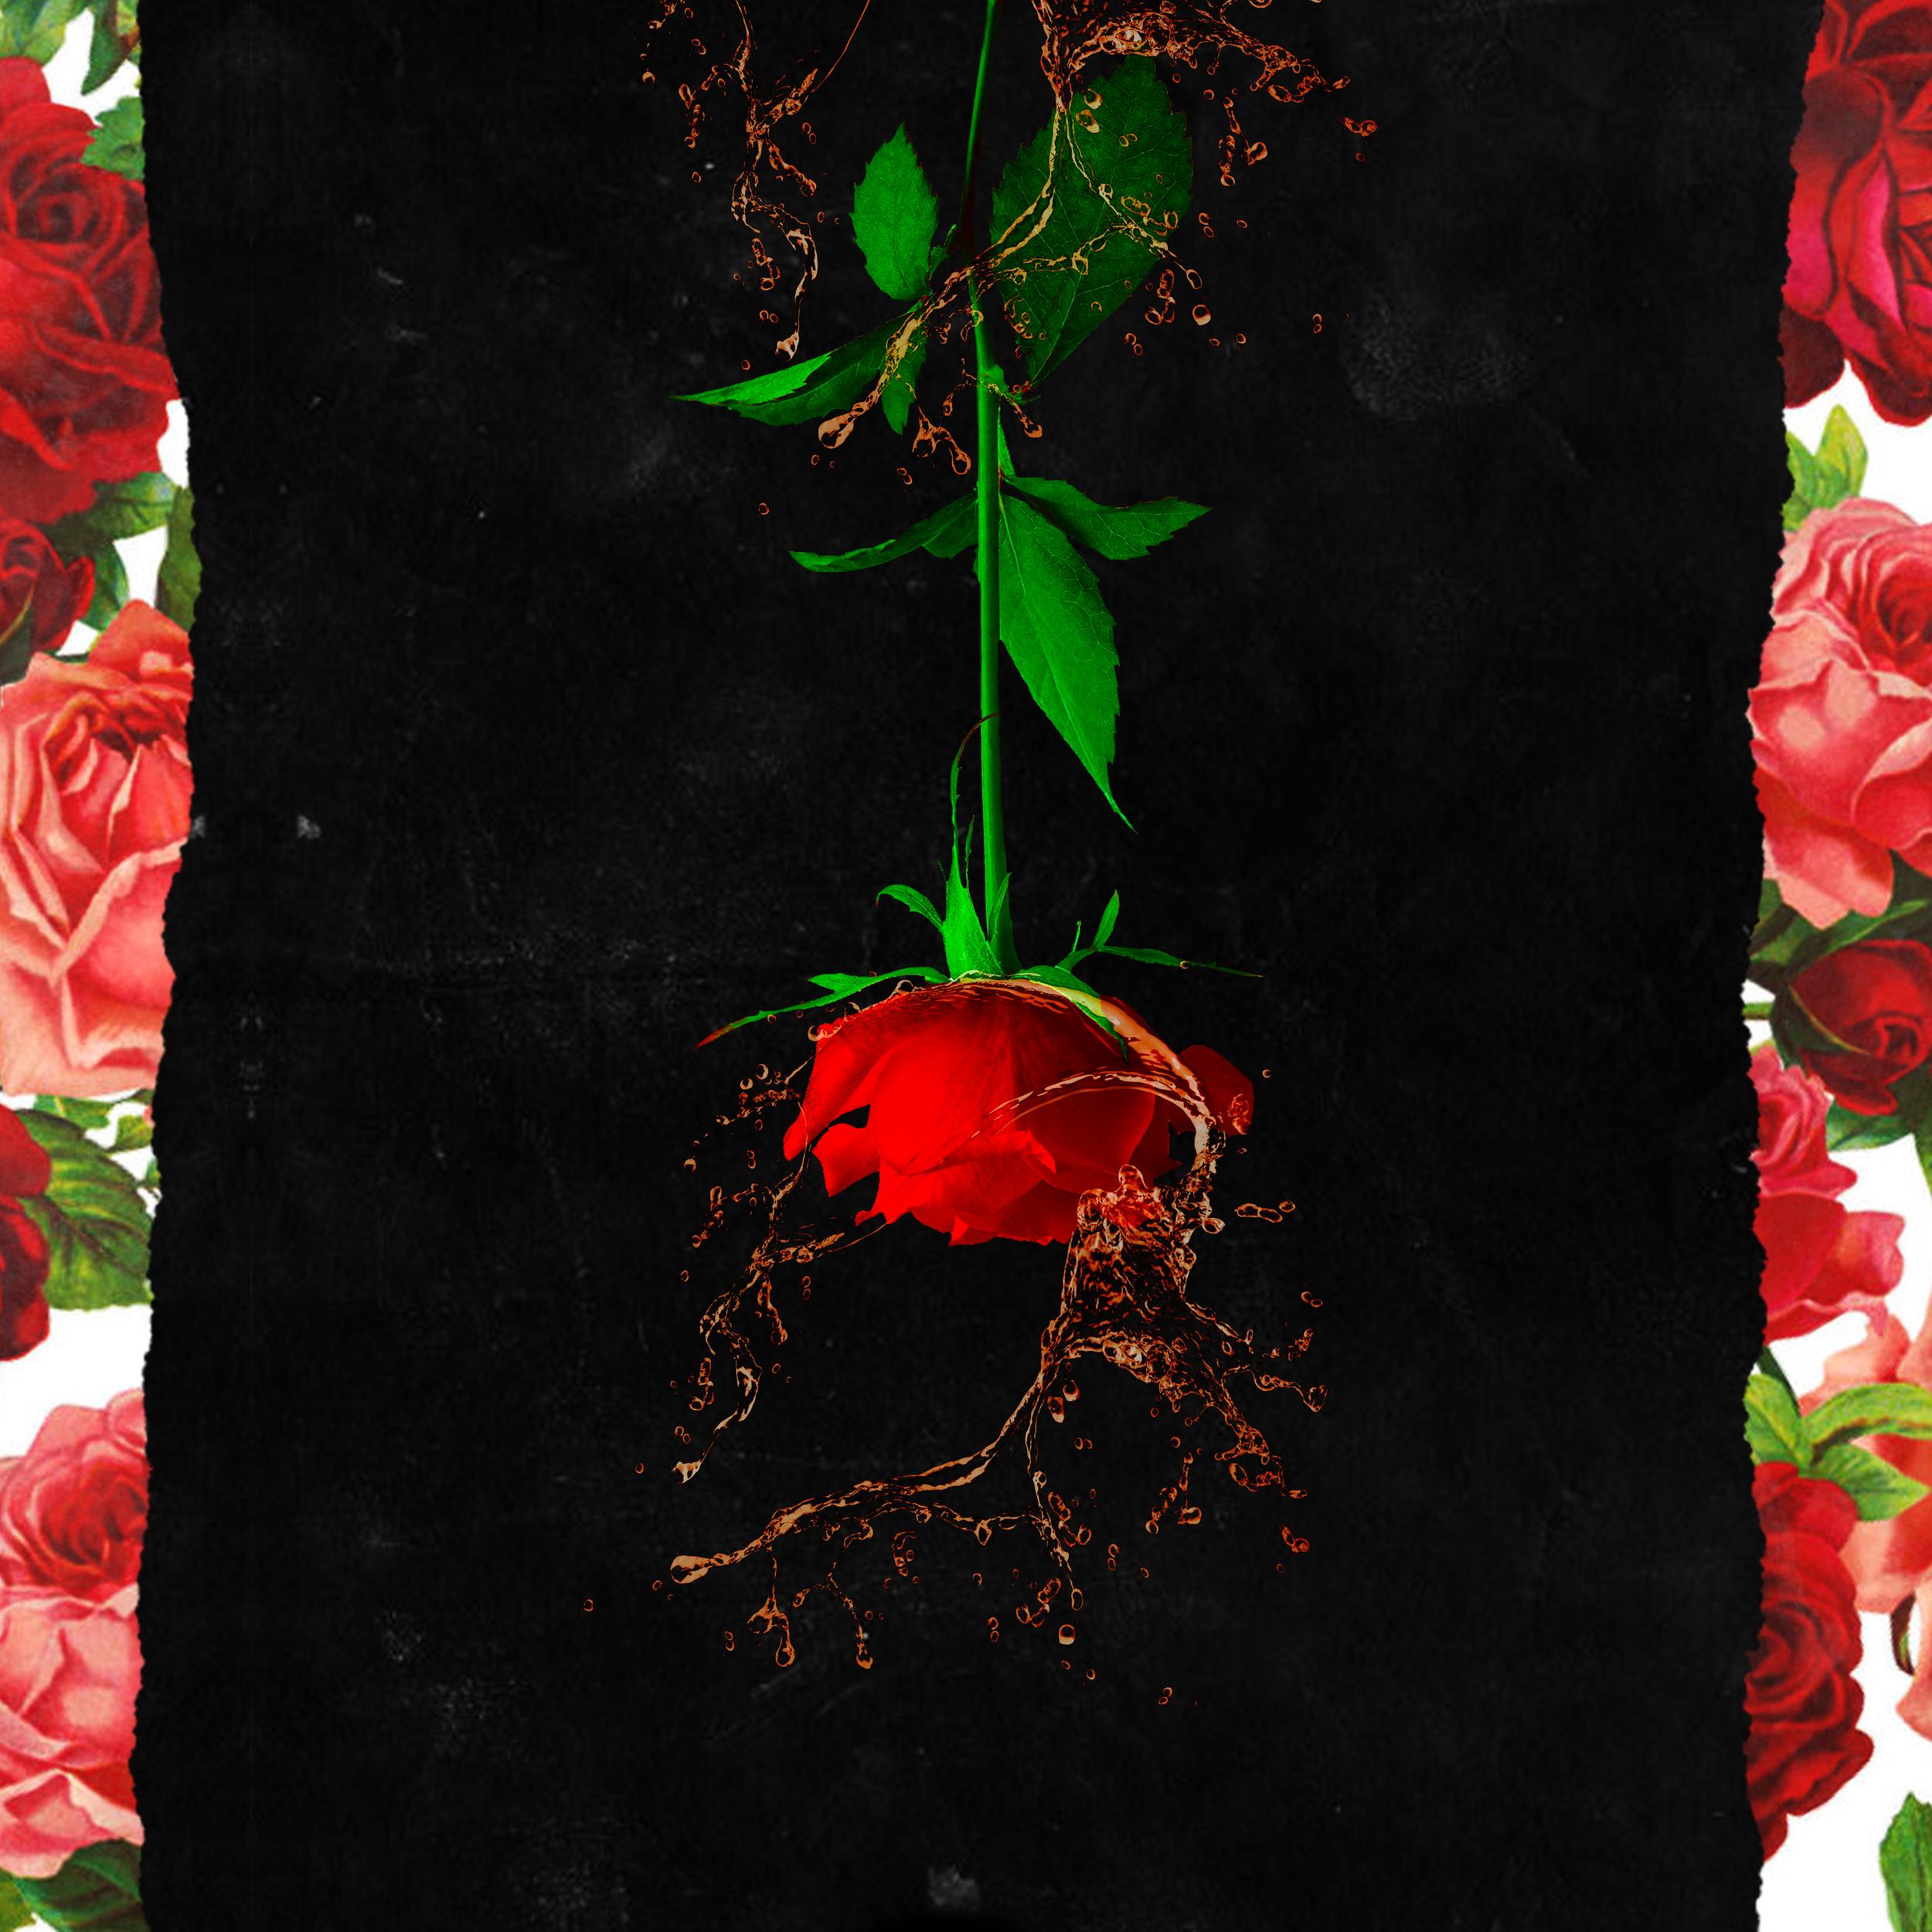 Cognac & Roses, self-titled debut. Released 3.23.18